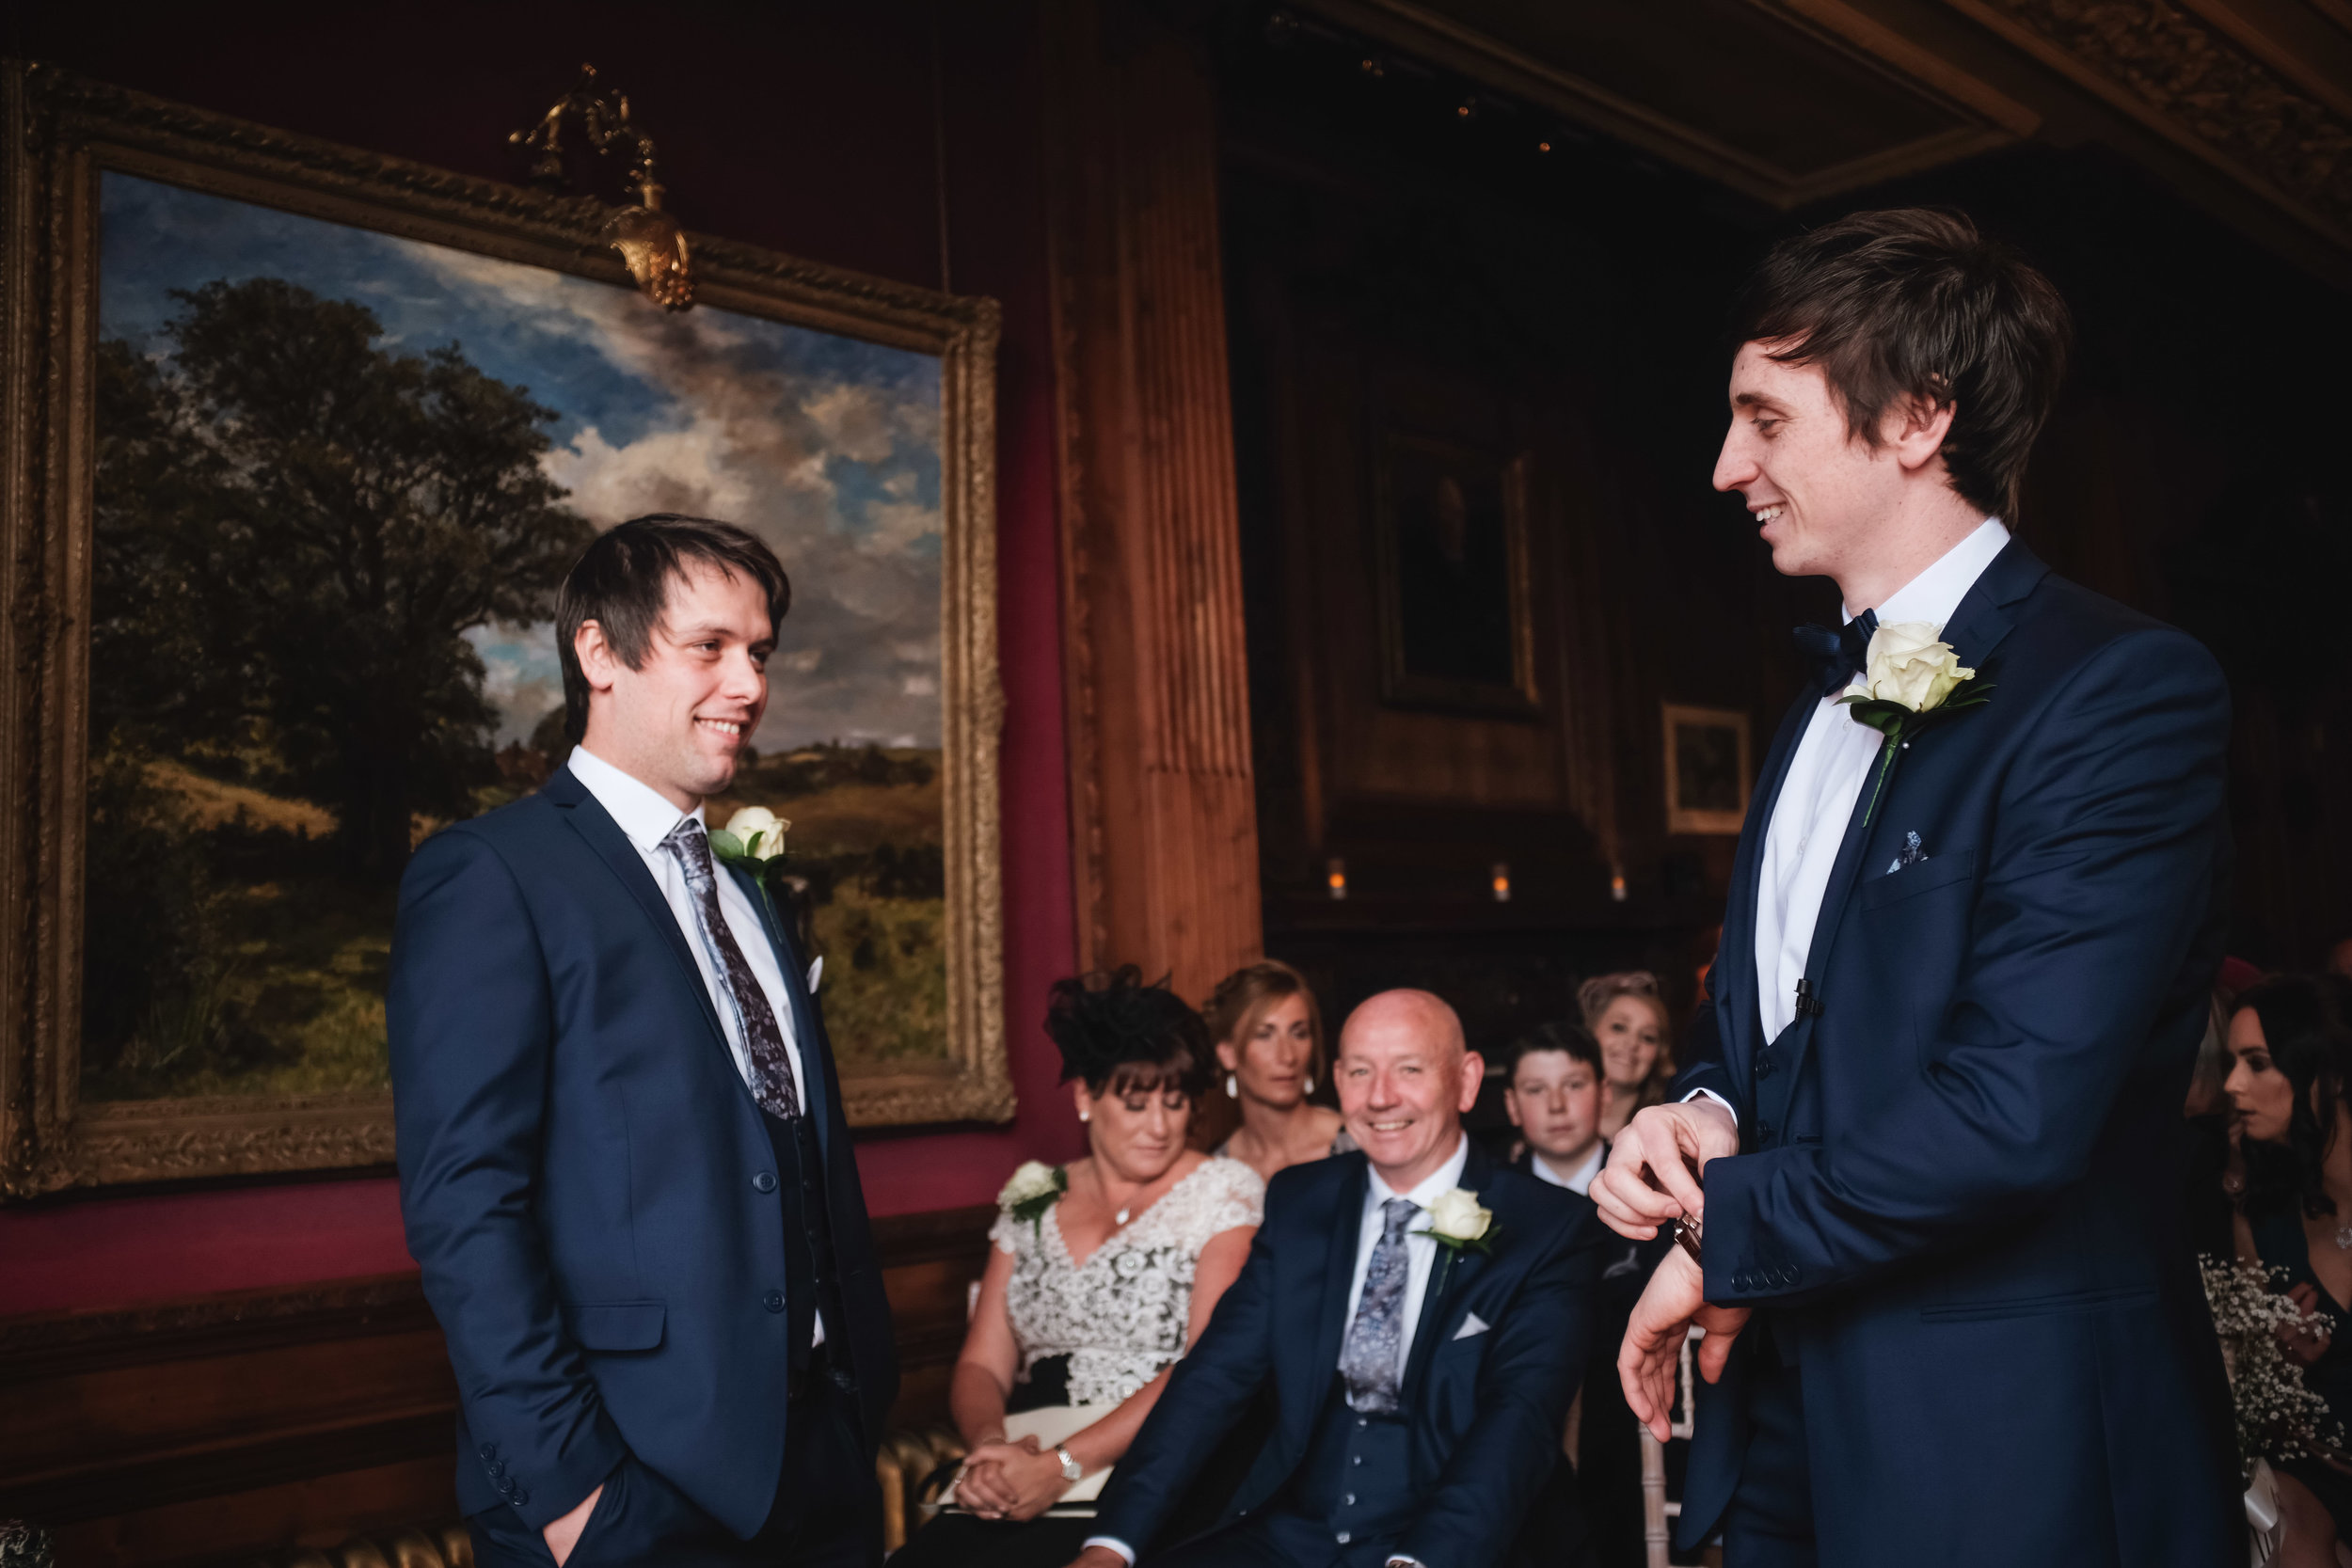 Thornton manor wedding photography cheshire wedding photographer liverpool manchester warrington chester wirral wedding BLOG (32 of 108).jpg